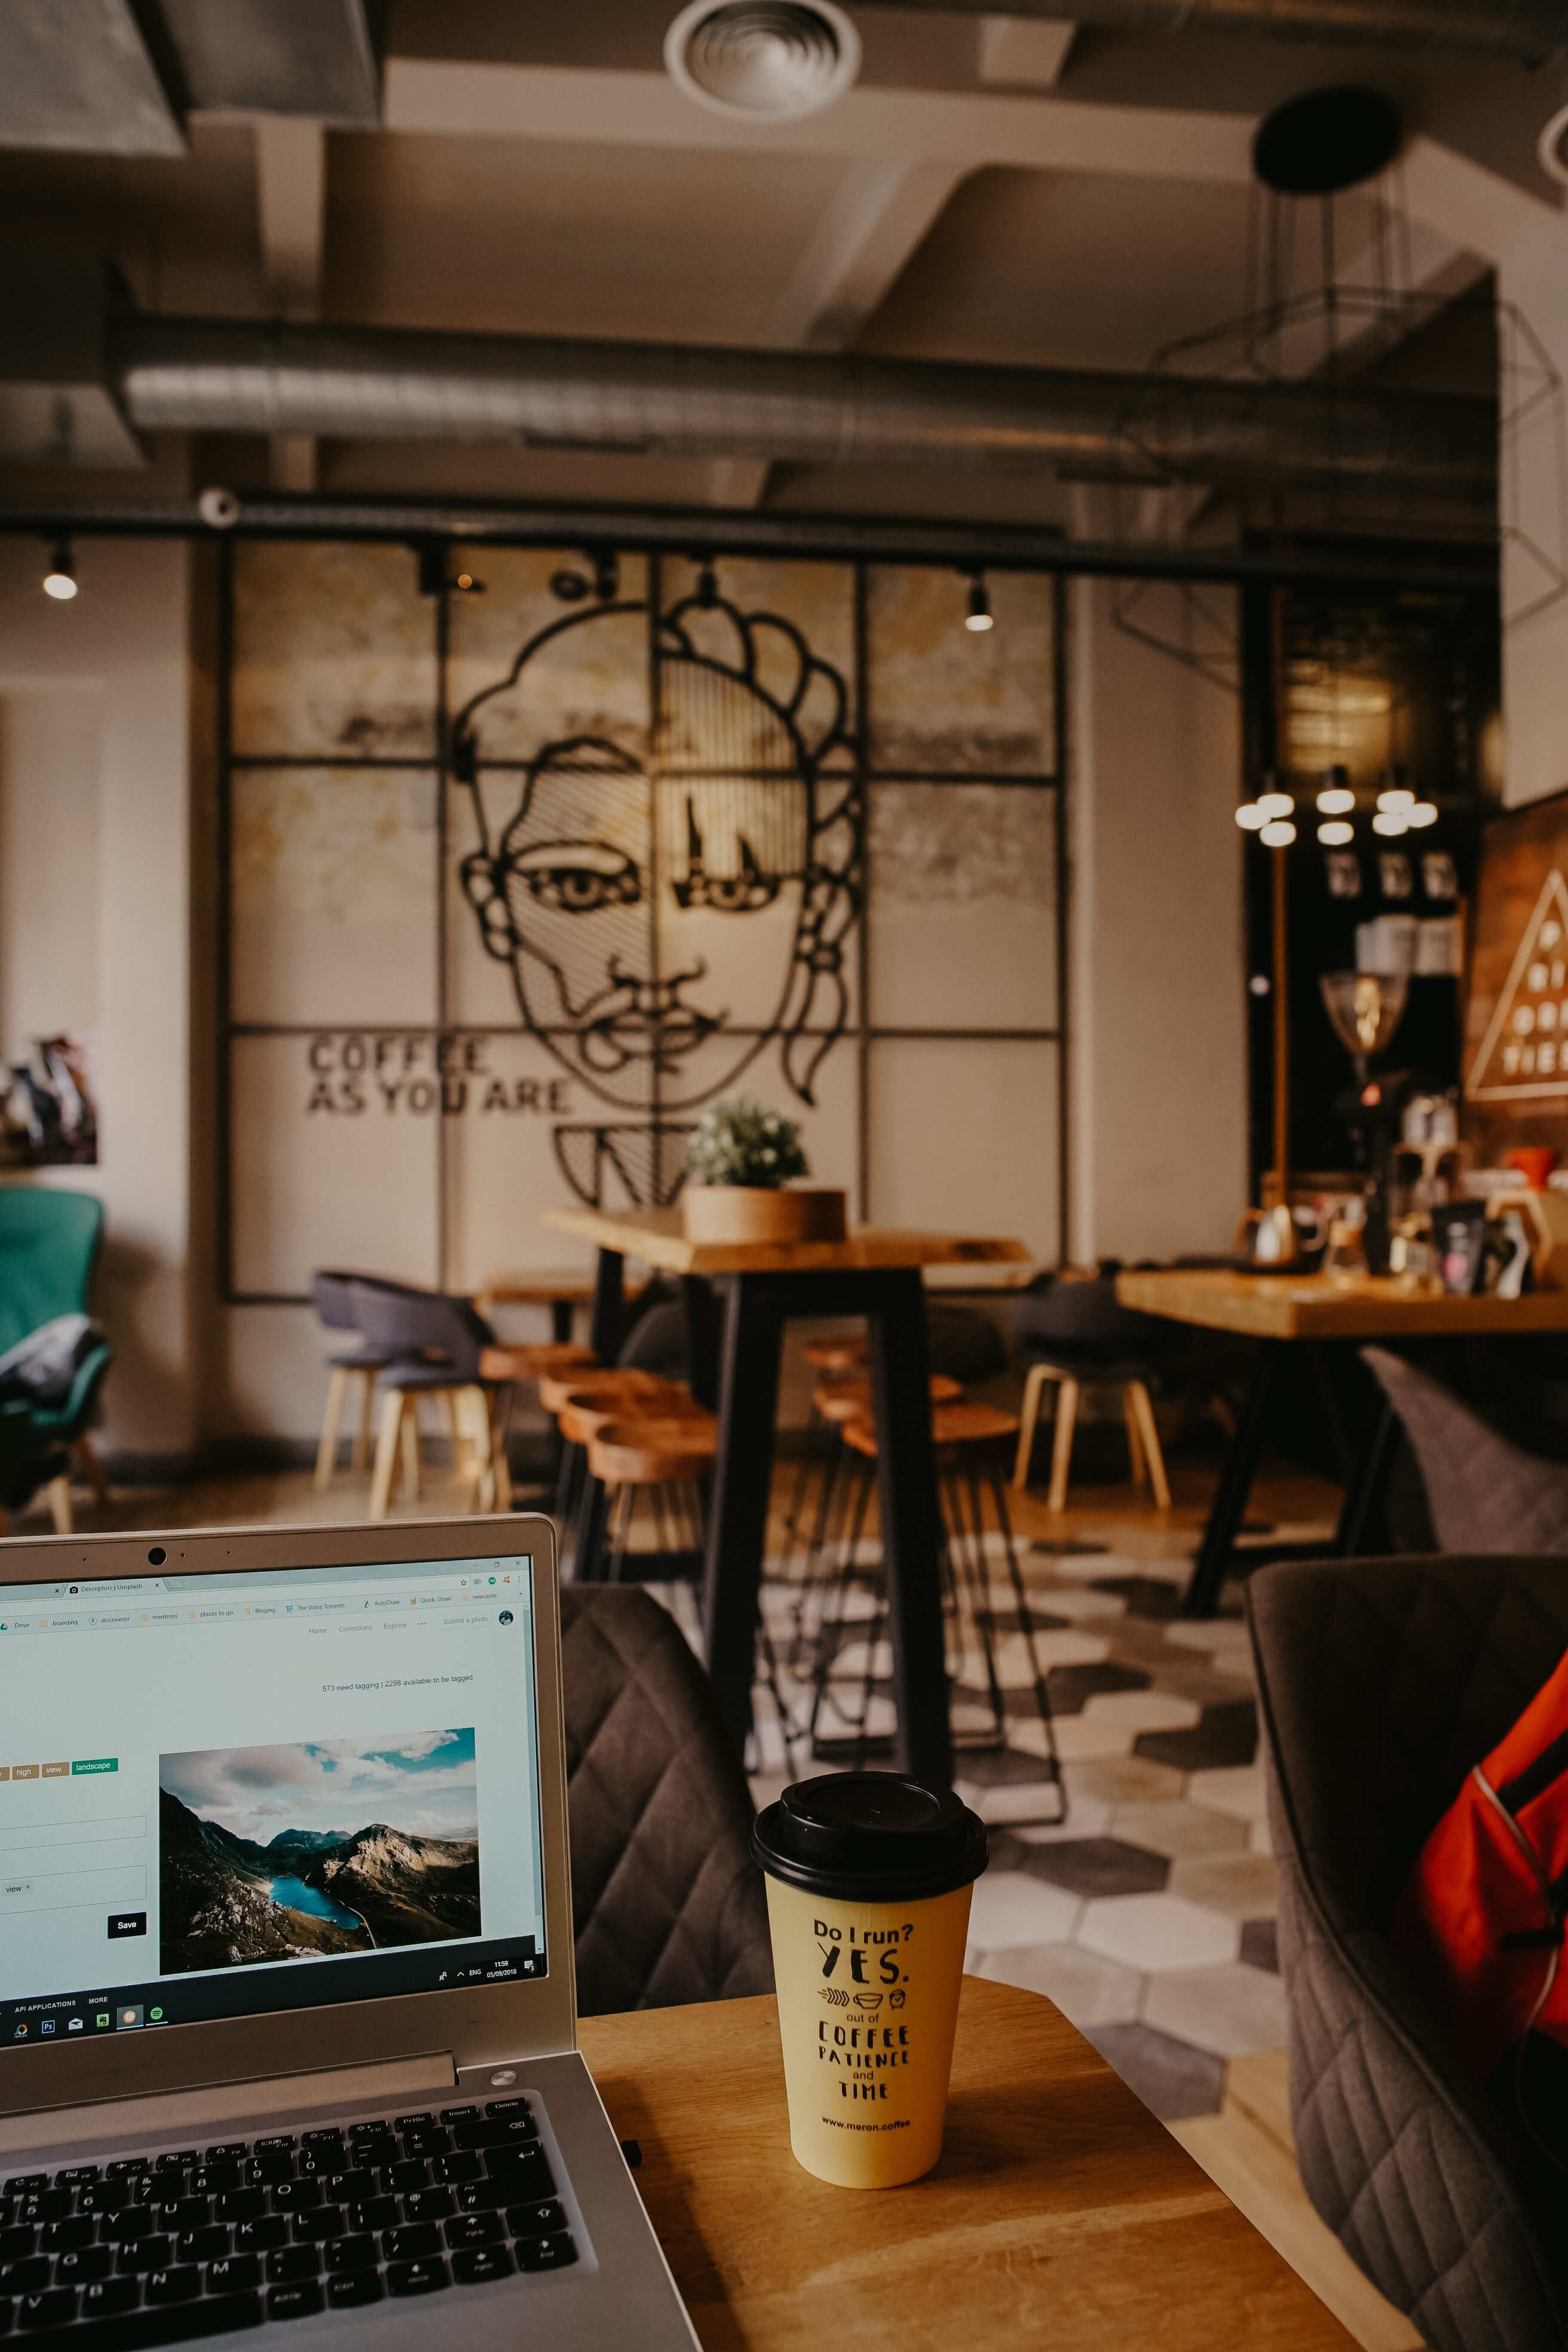 brown coffee cup beside laptop